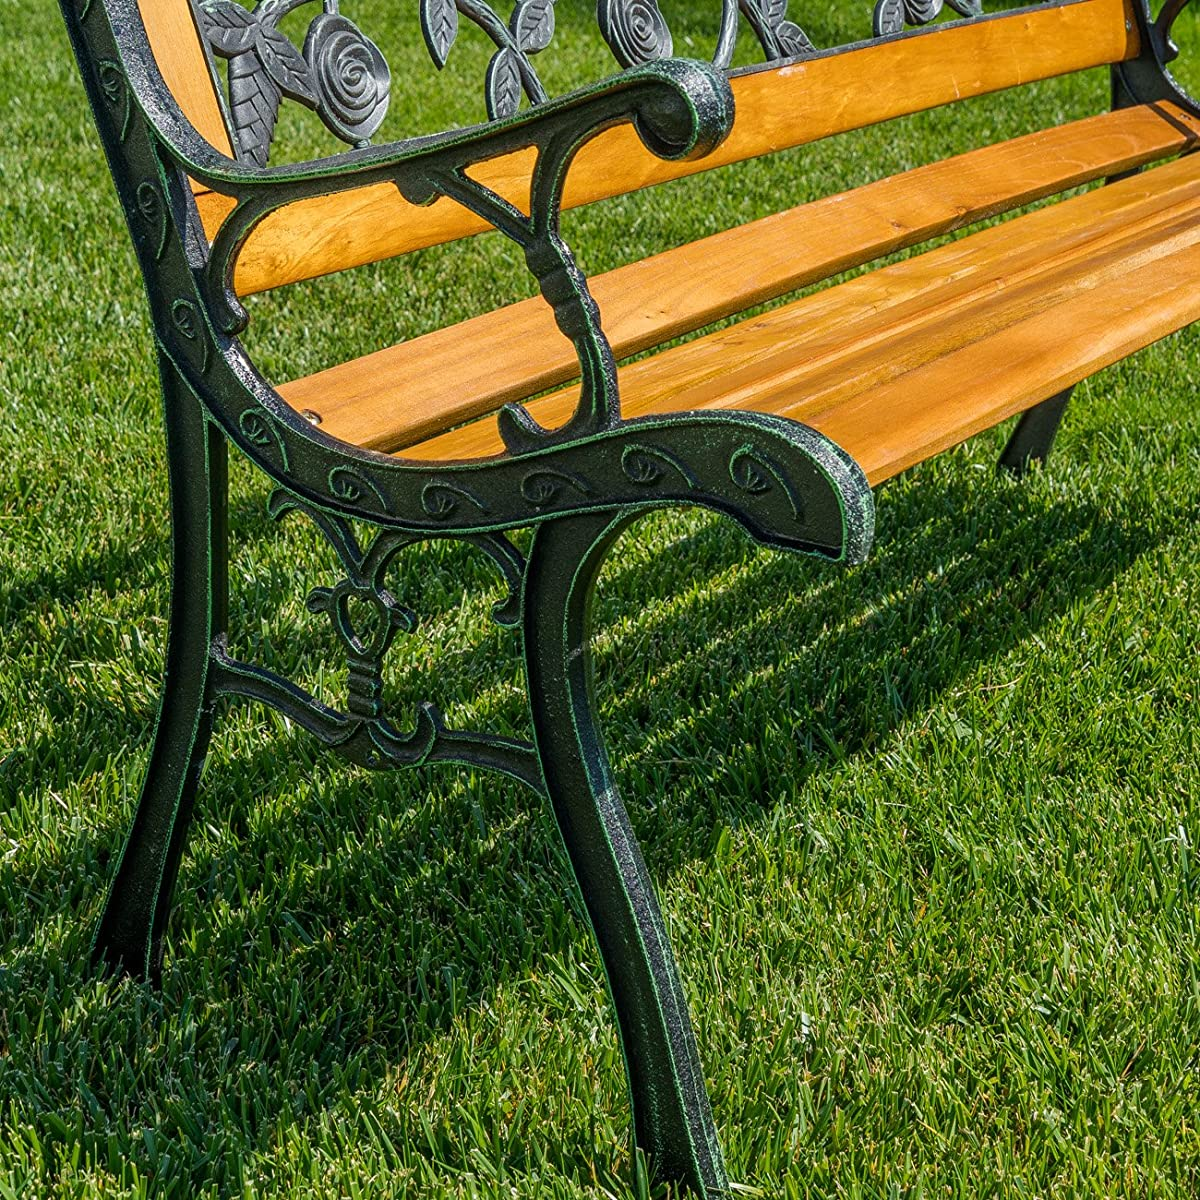 Belleze Rose Resin Back Park Bench Cast Iron Hardwood Outdoor Porch Seat